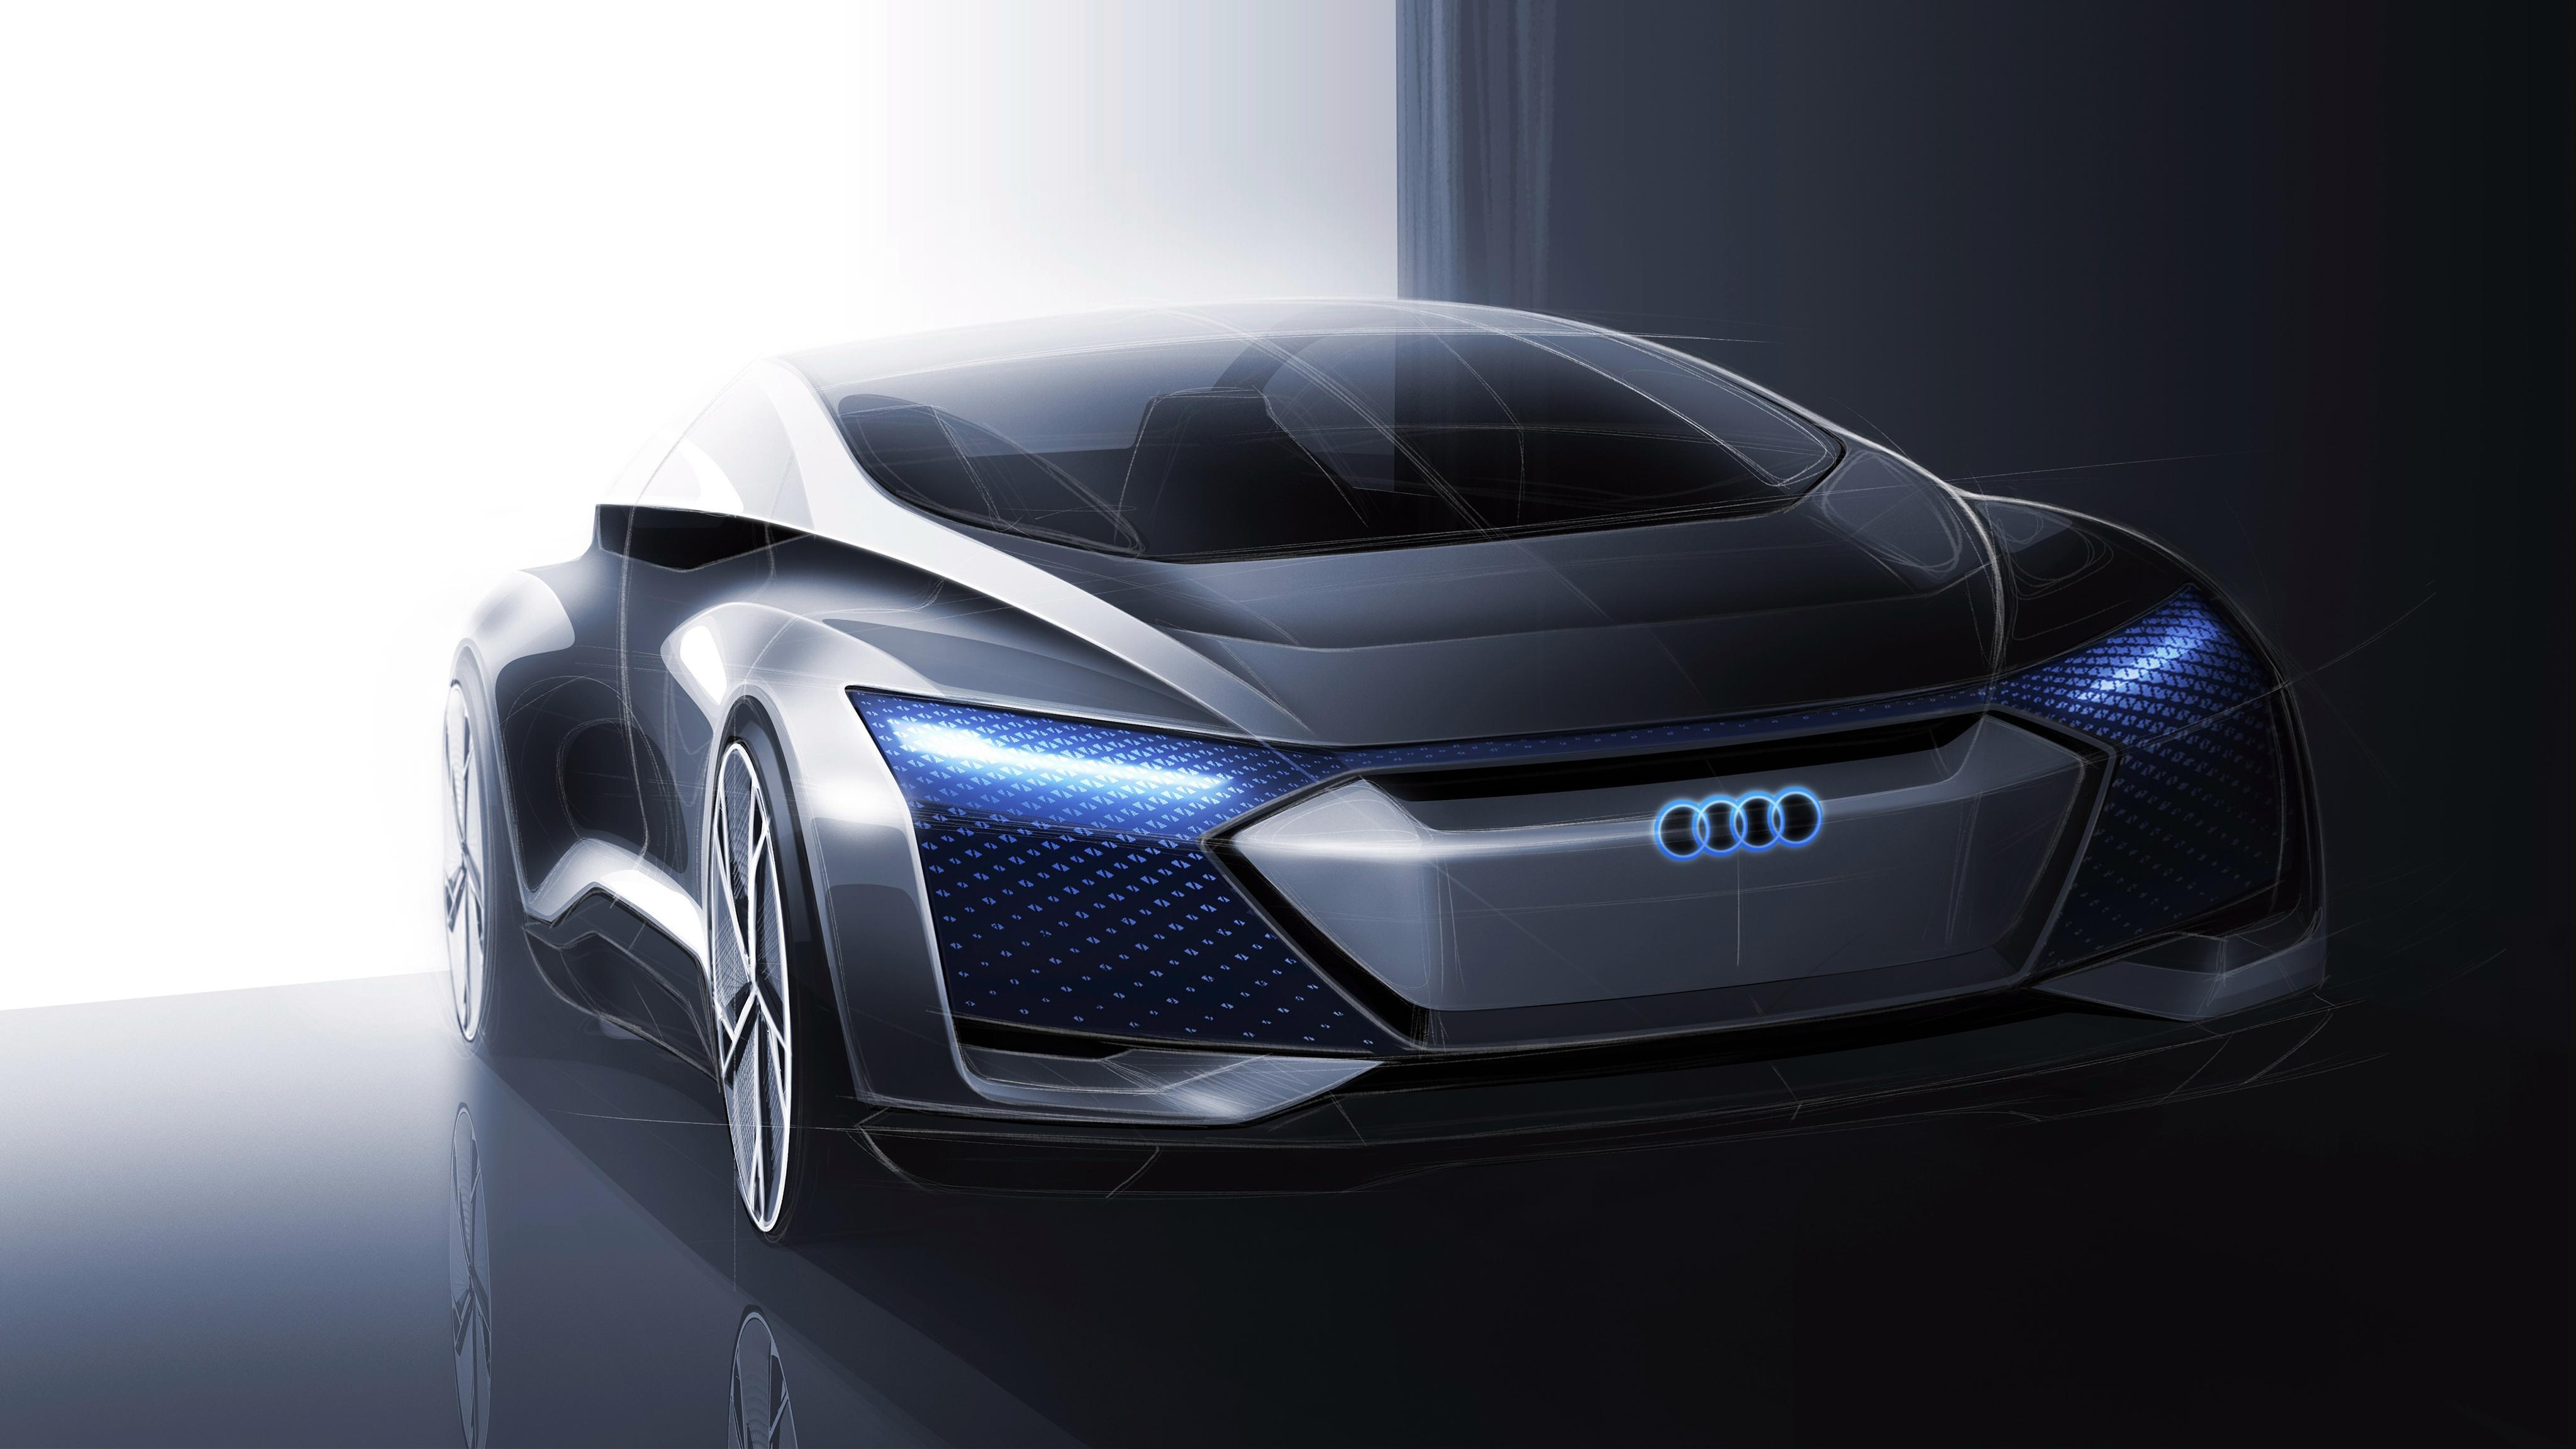 Audi Concept Wallpapers Wallpaper Cave